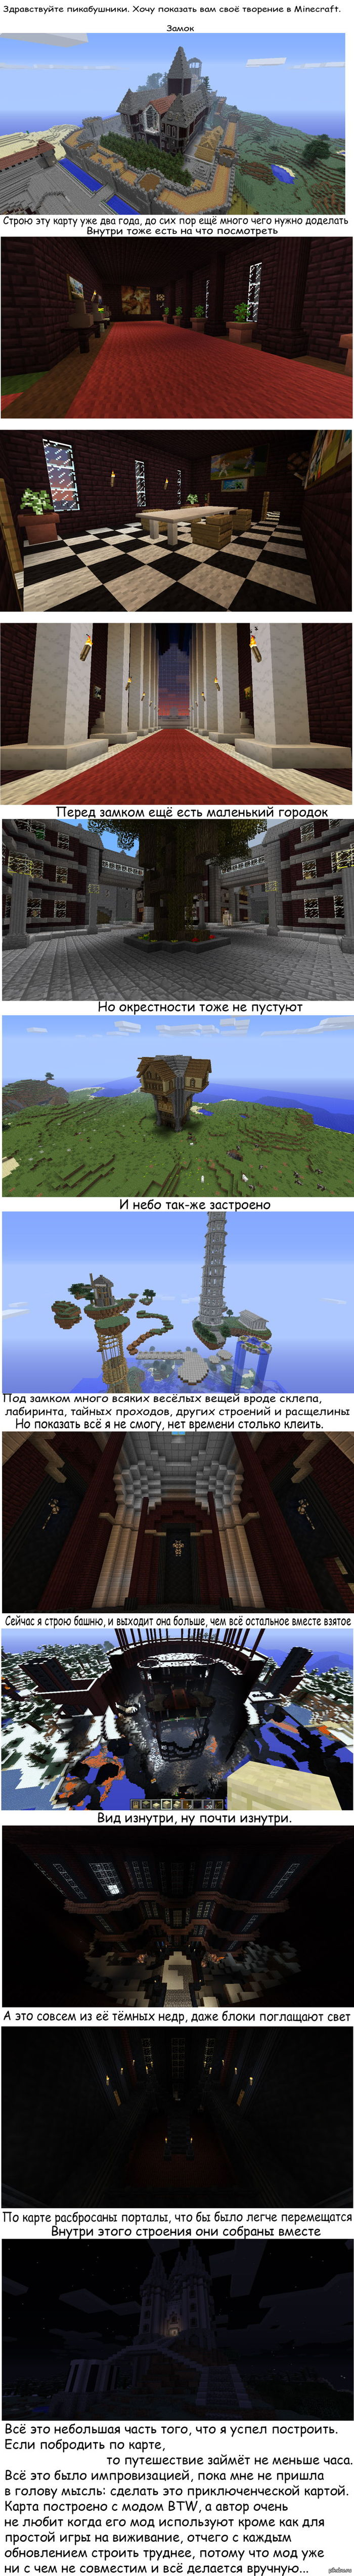 Minecraft Adventure Map.